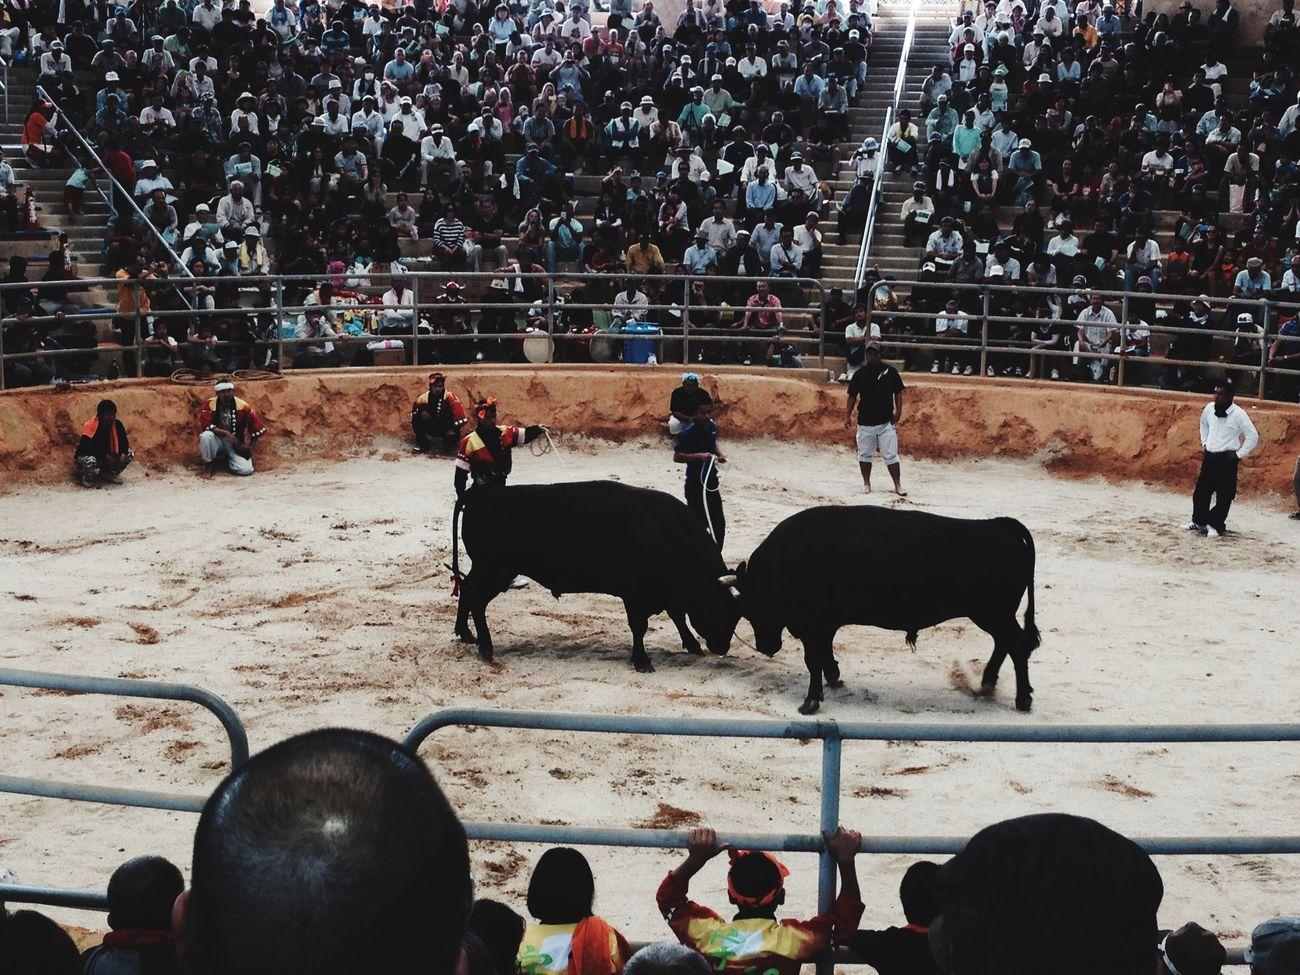 Bull fight ....